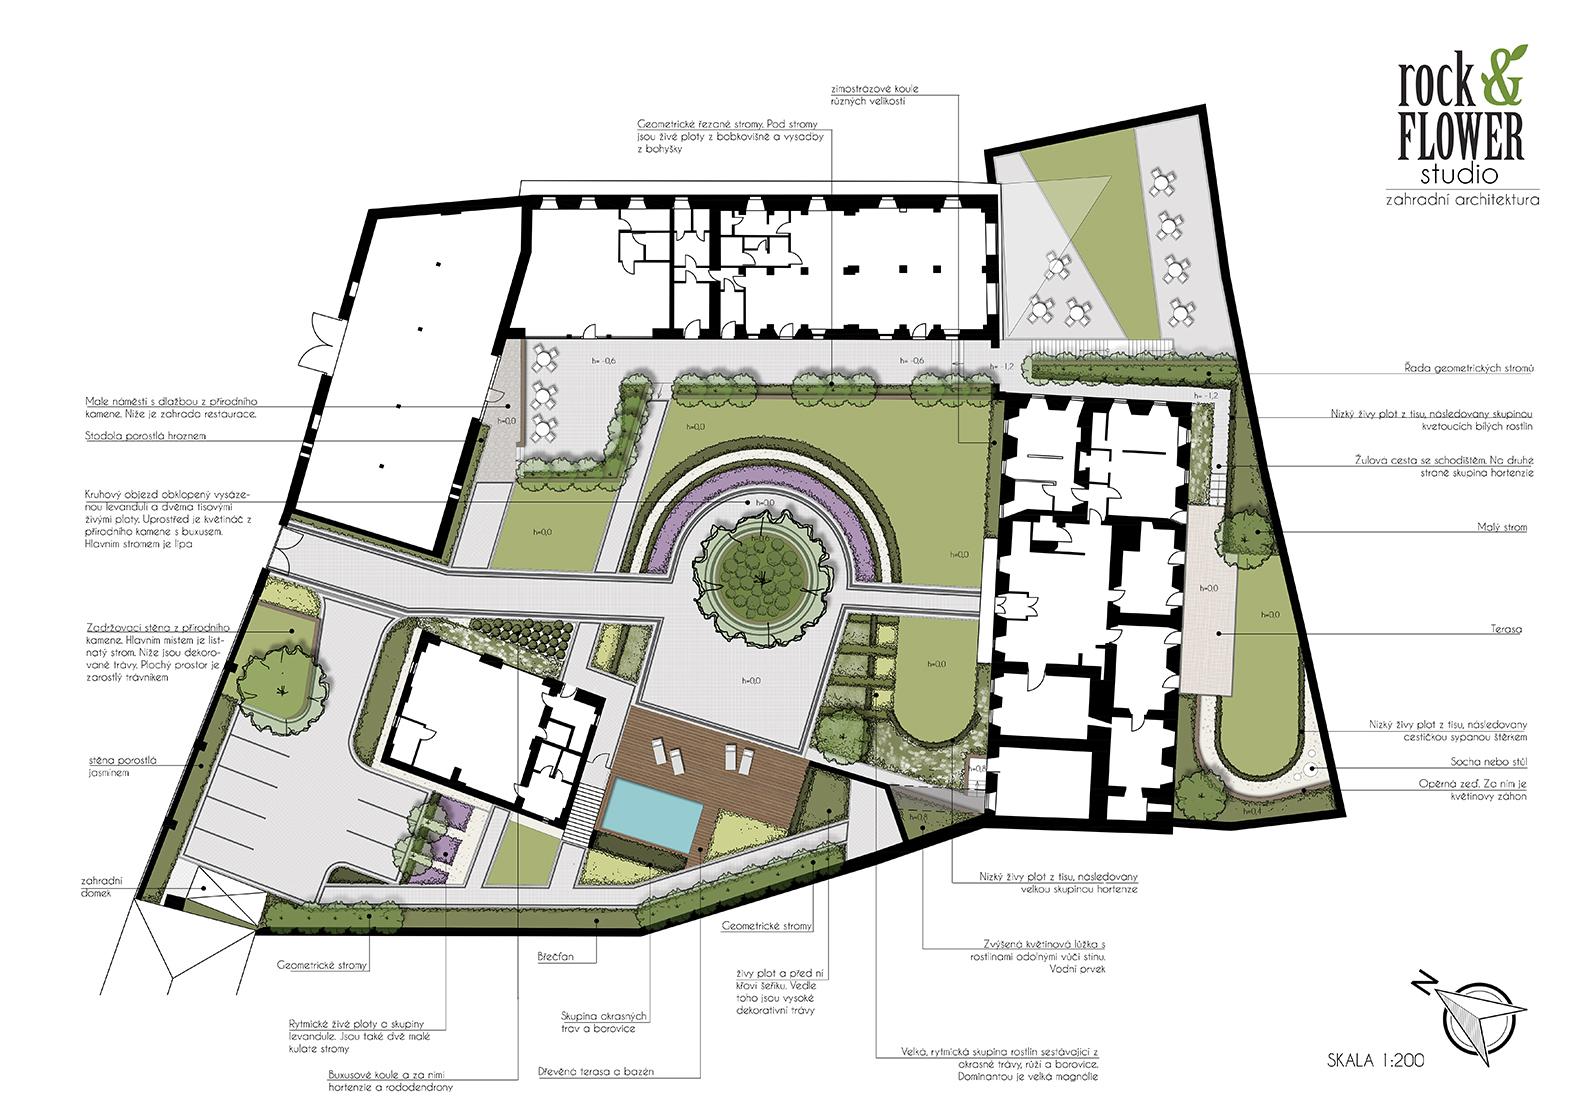 projekt-zahrady-plzen-chotesov-zahradniarchitekt-praha-rockandflowerstudio-navhr-zahrady-okrasnazahrada